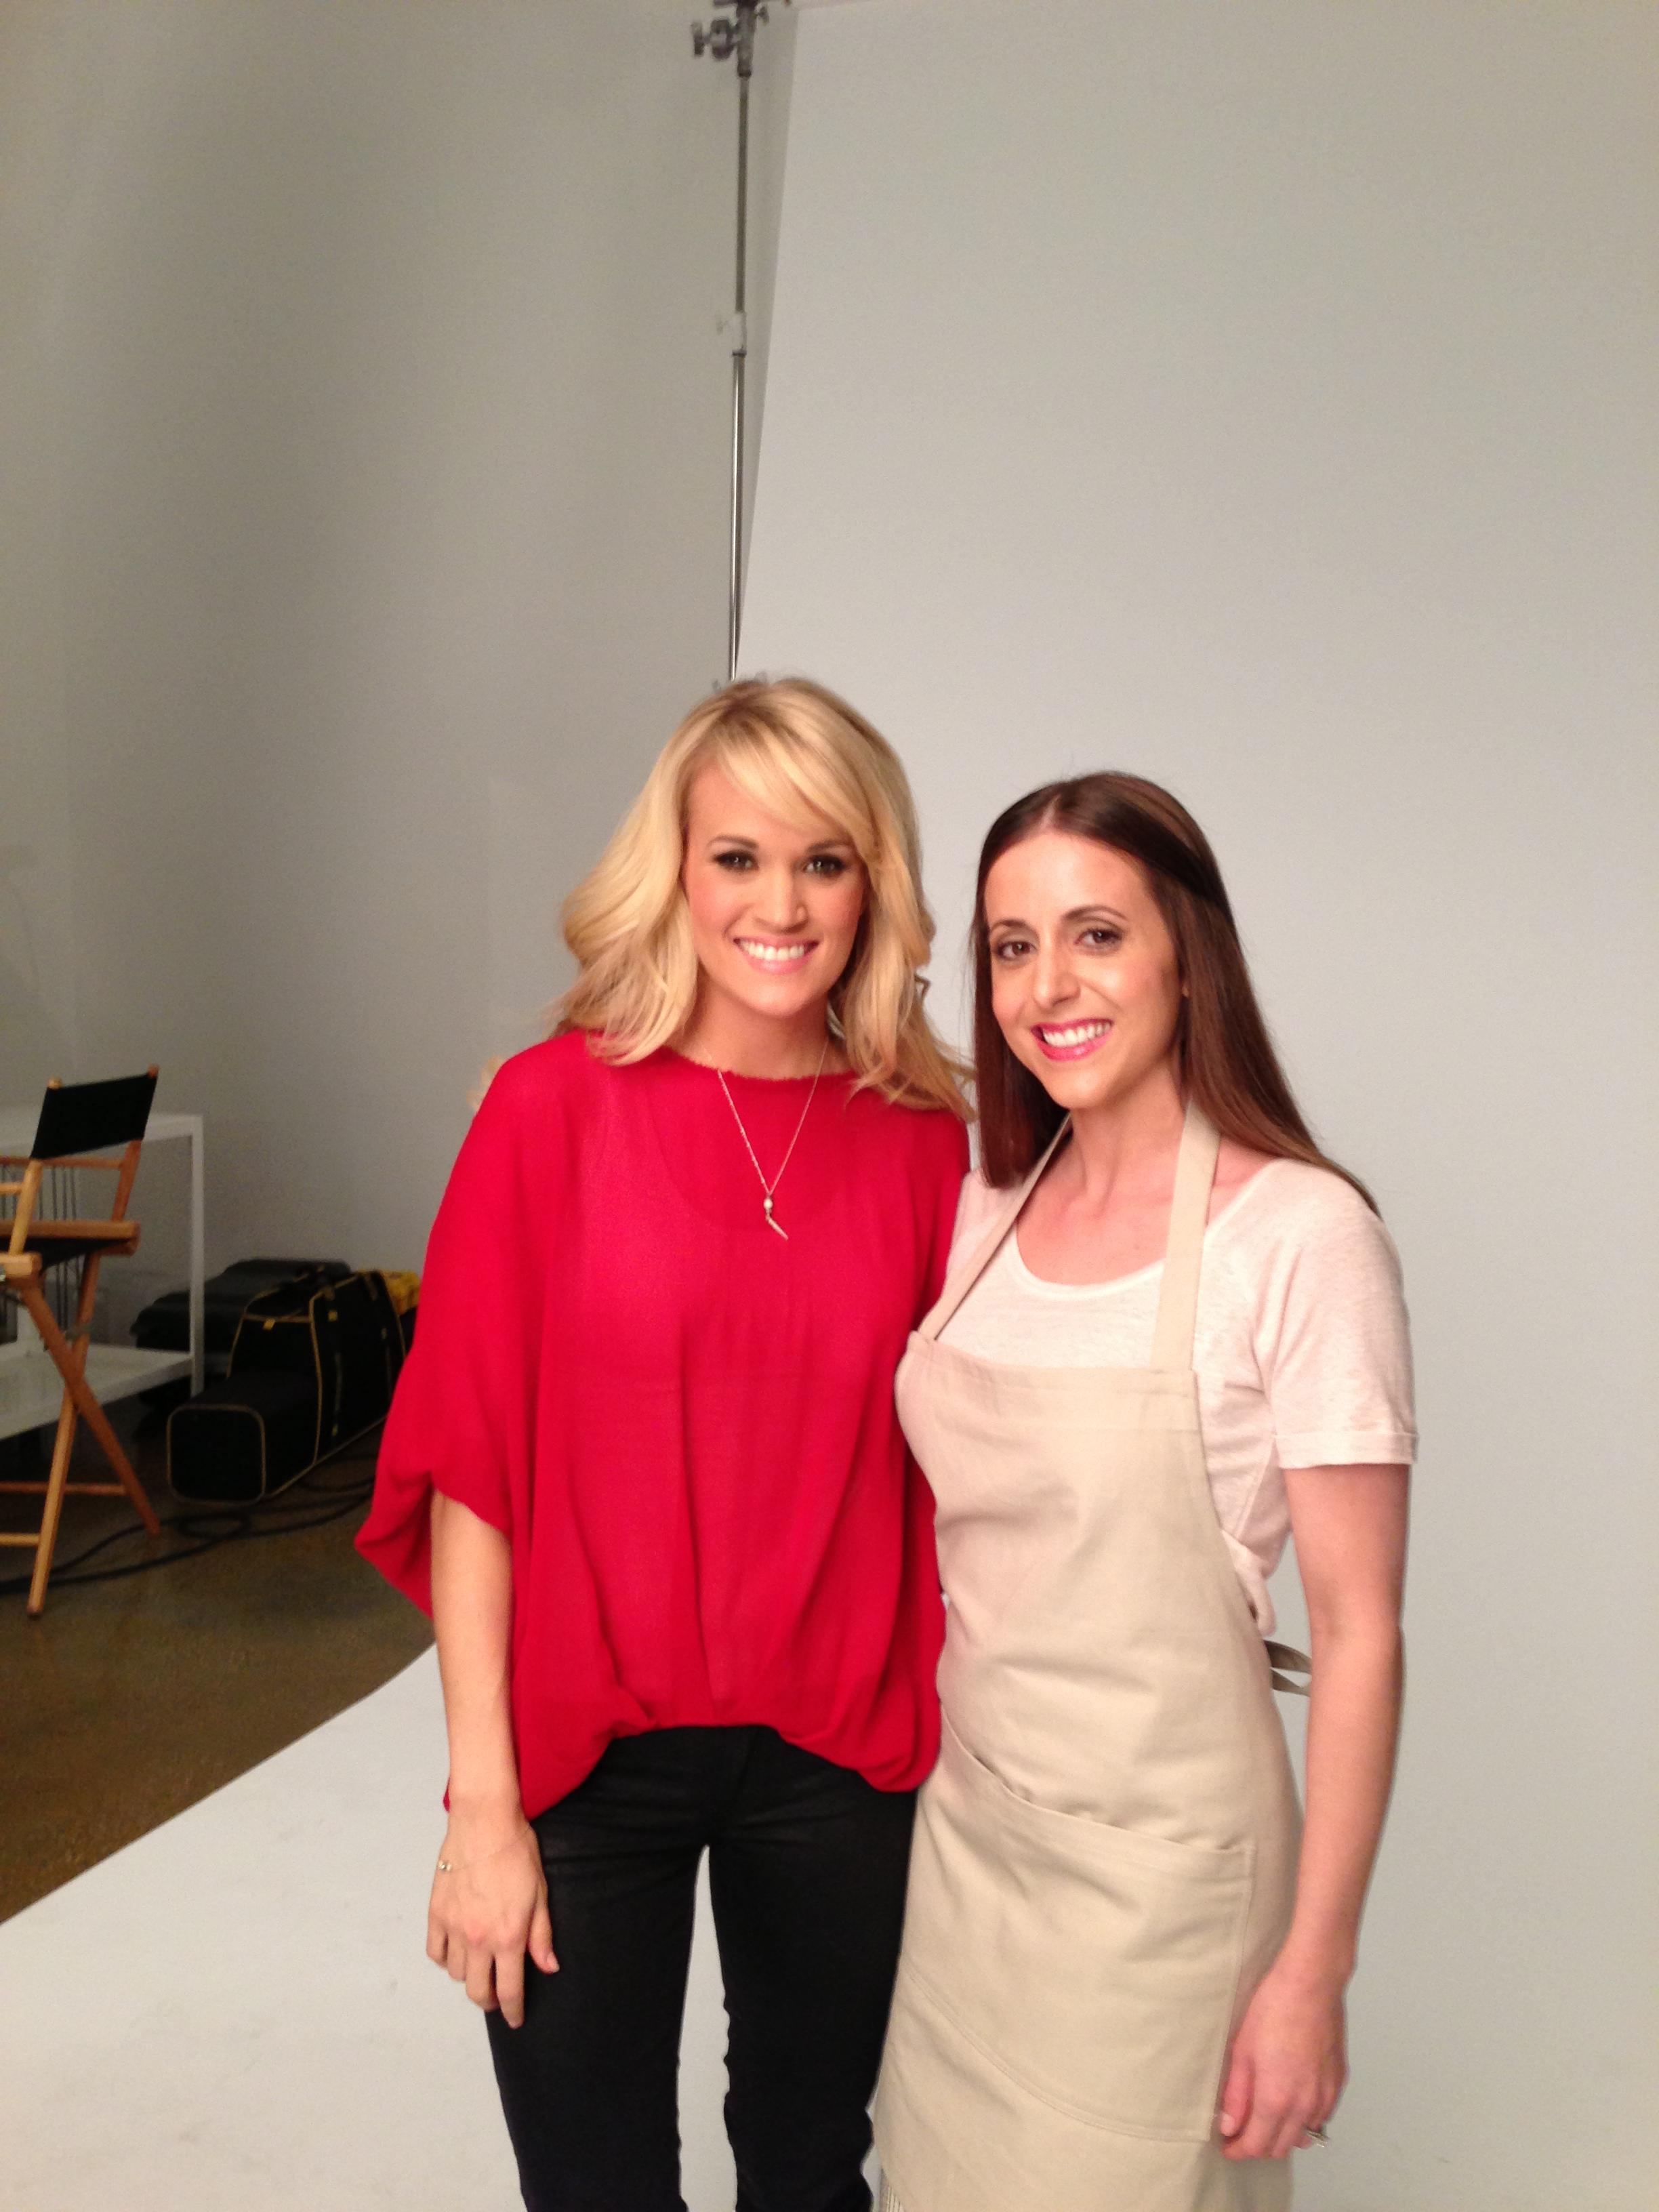 LeeAnn with Carrie Underwood on set